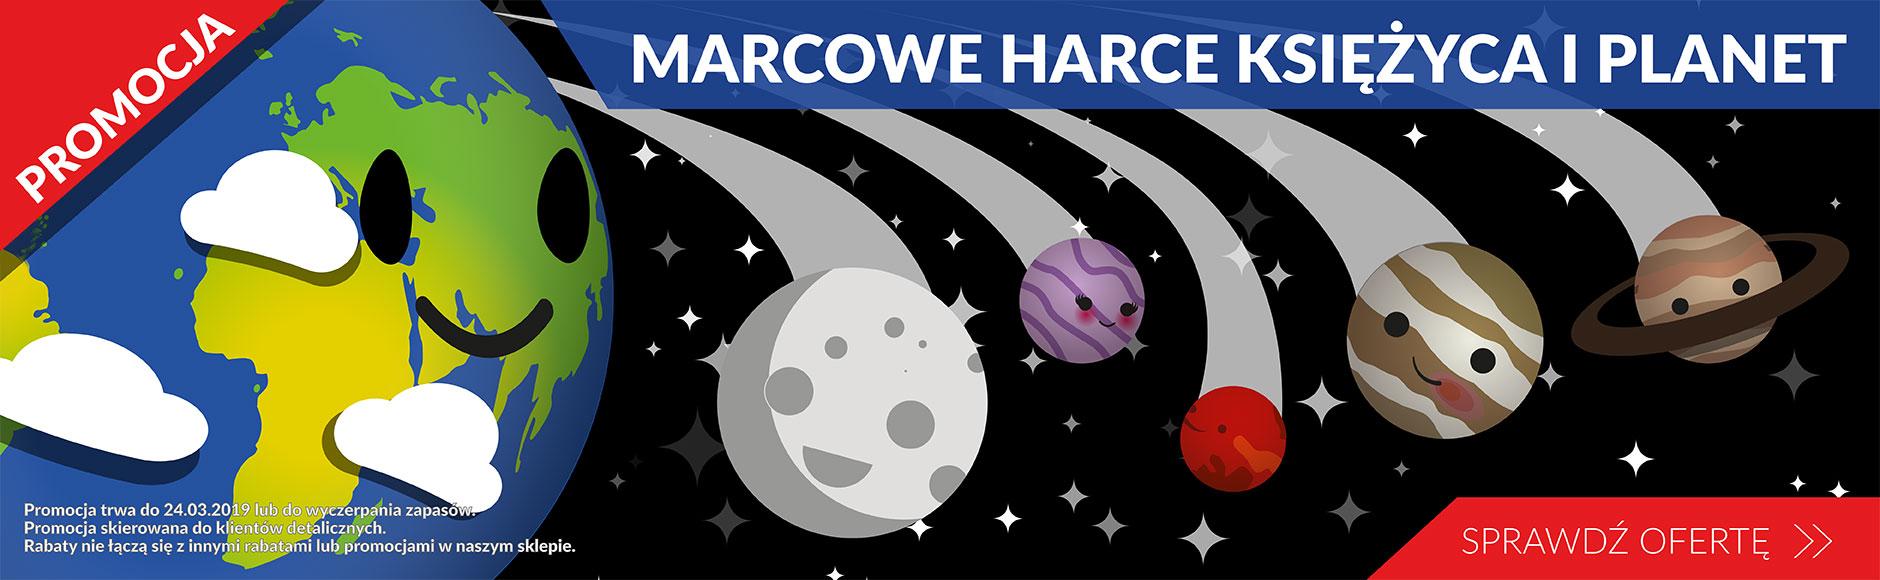 Harce